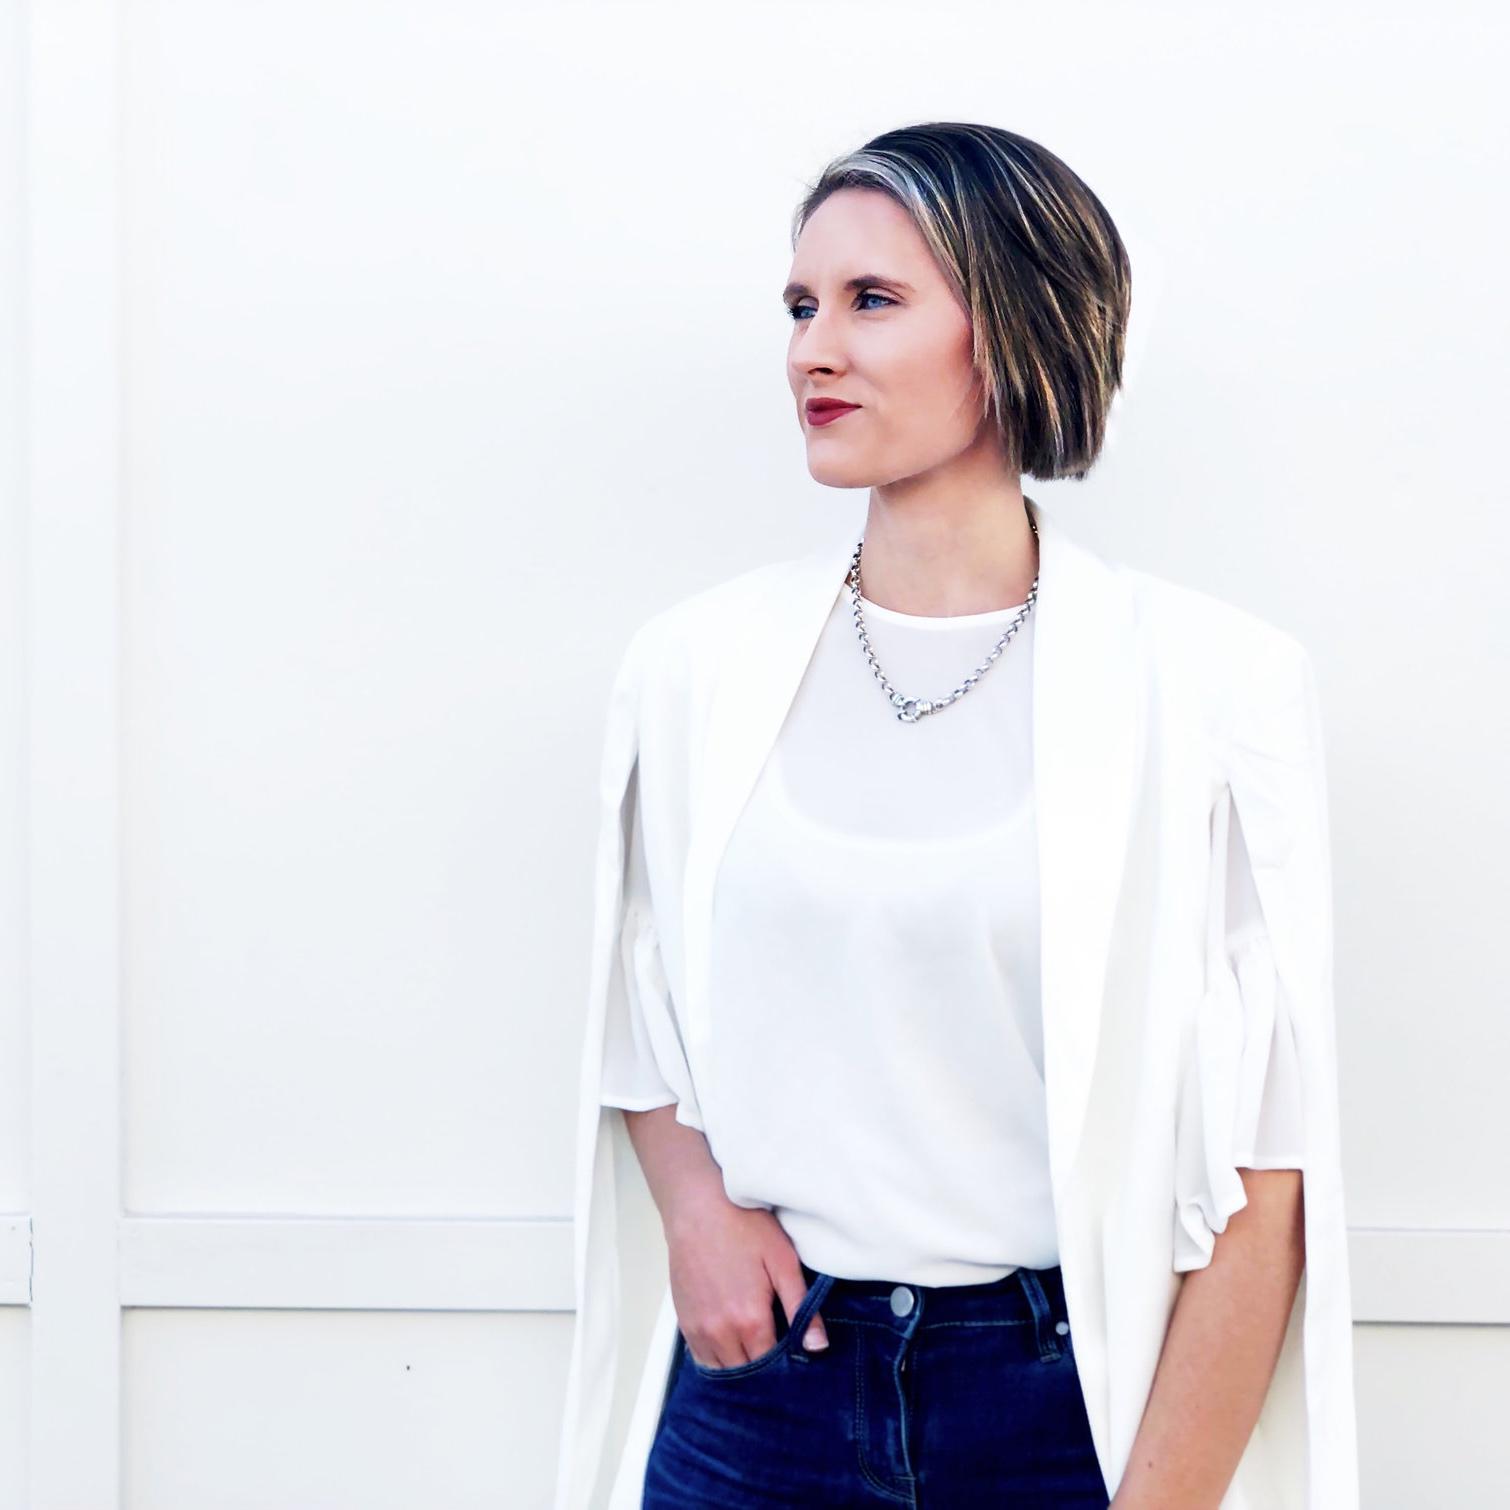 Amanda-Lowry-Brand-Strategist-2.jpg